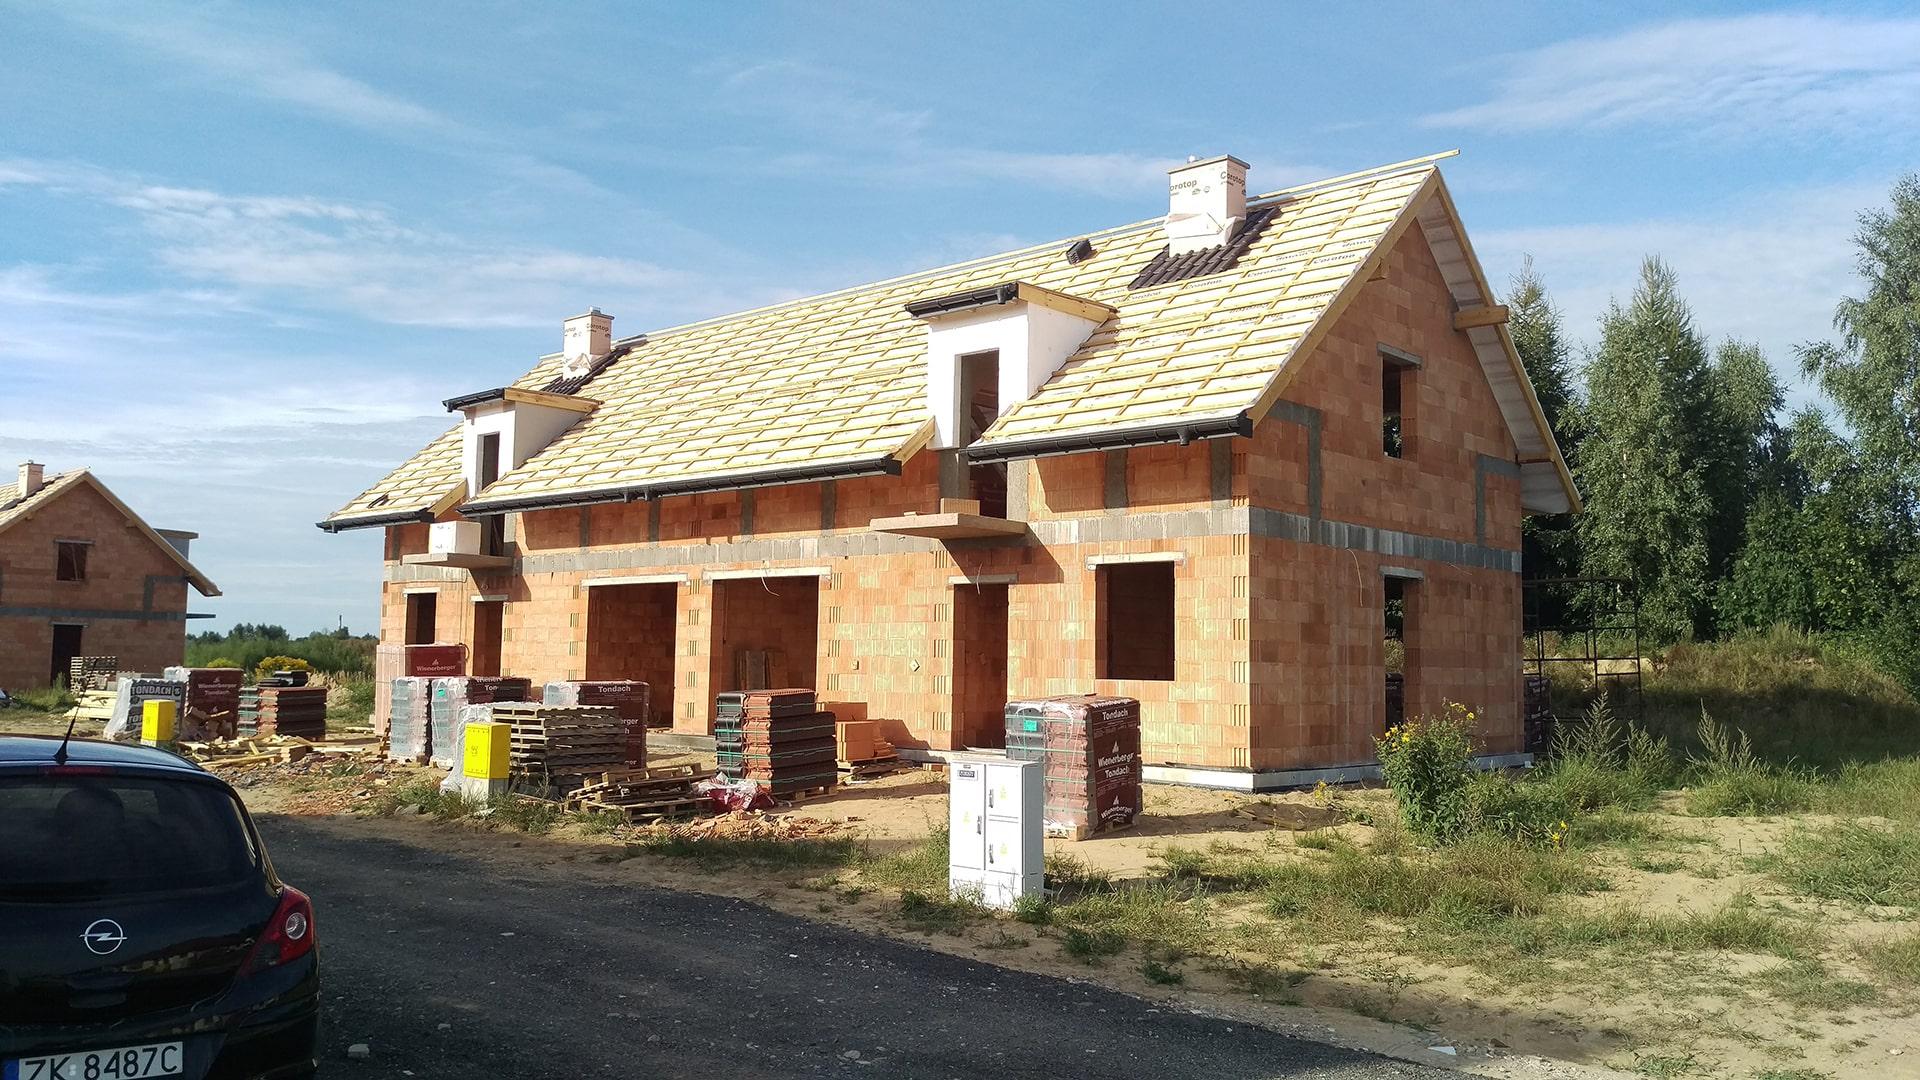 domki szeregowe konikowo